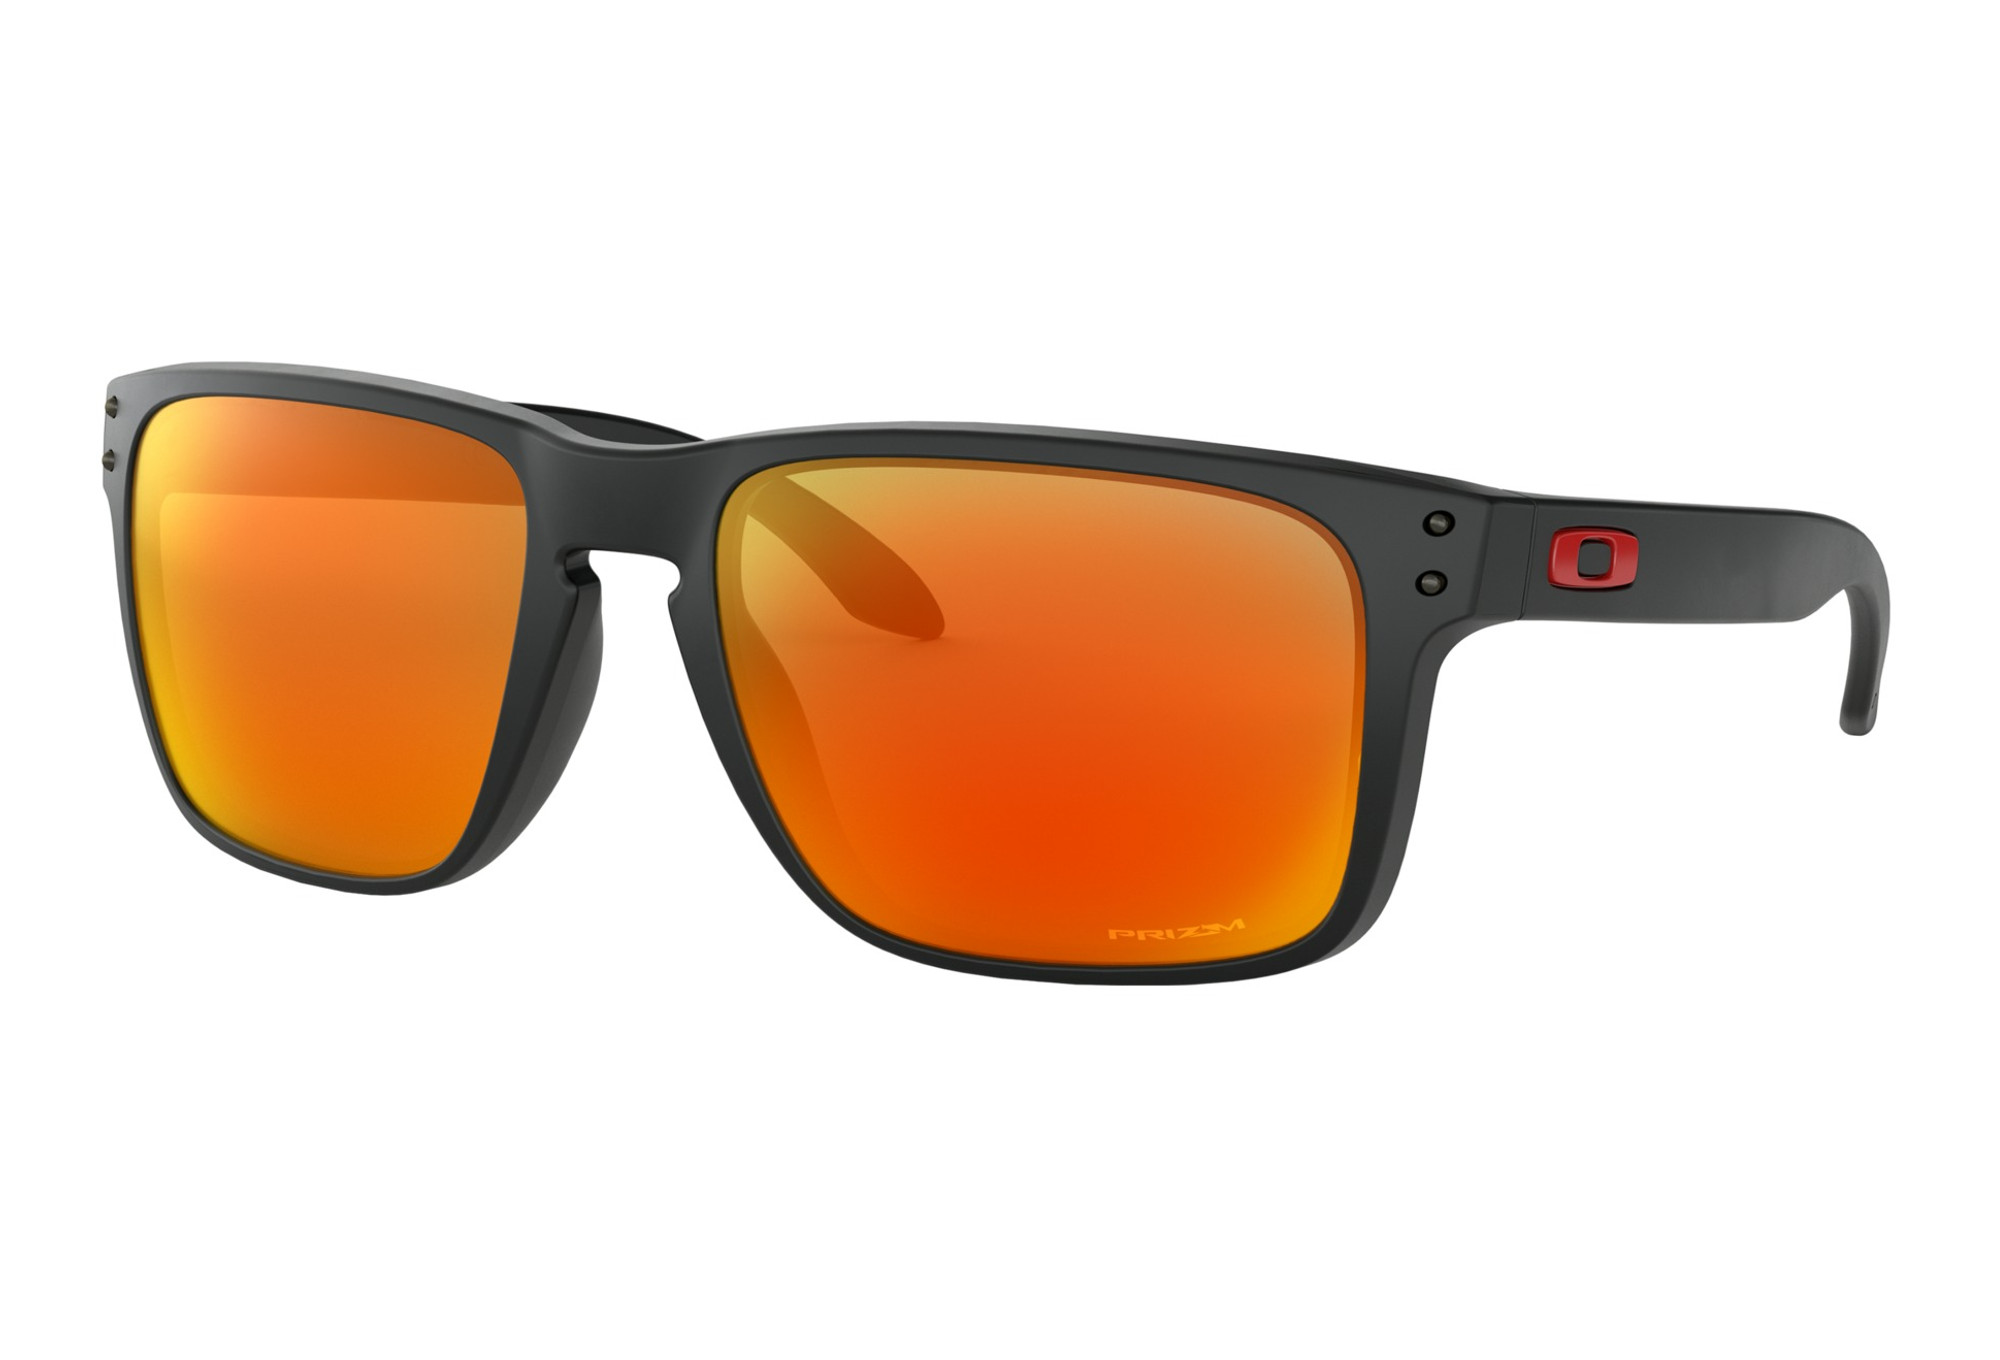 8b09a61486 Oakley Holbrook XL Sunglasses Black - Prizm Ruby OO9417-0459 ...